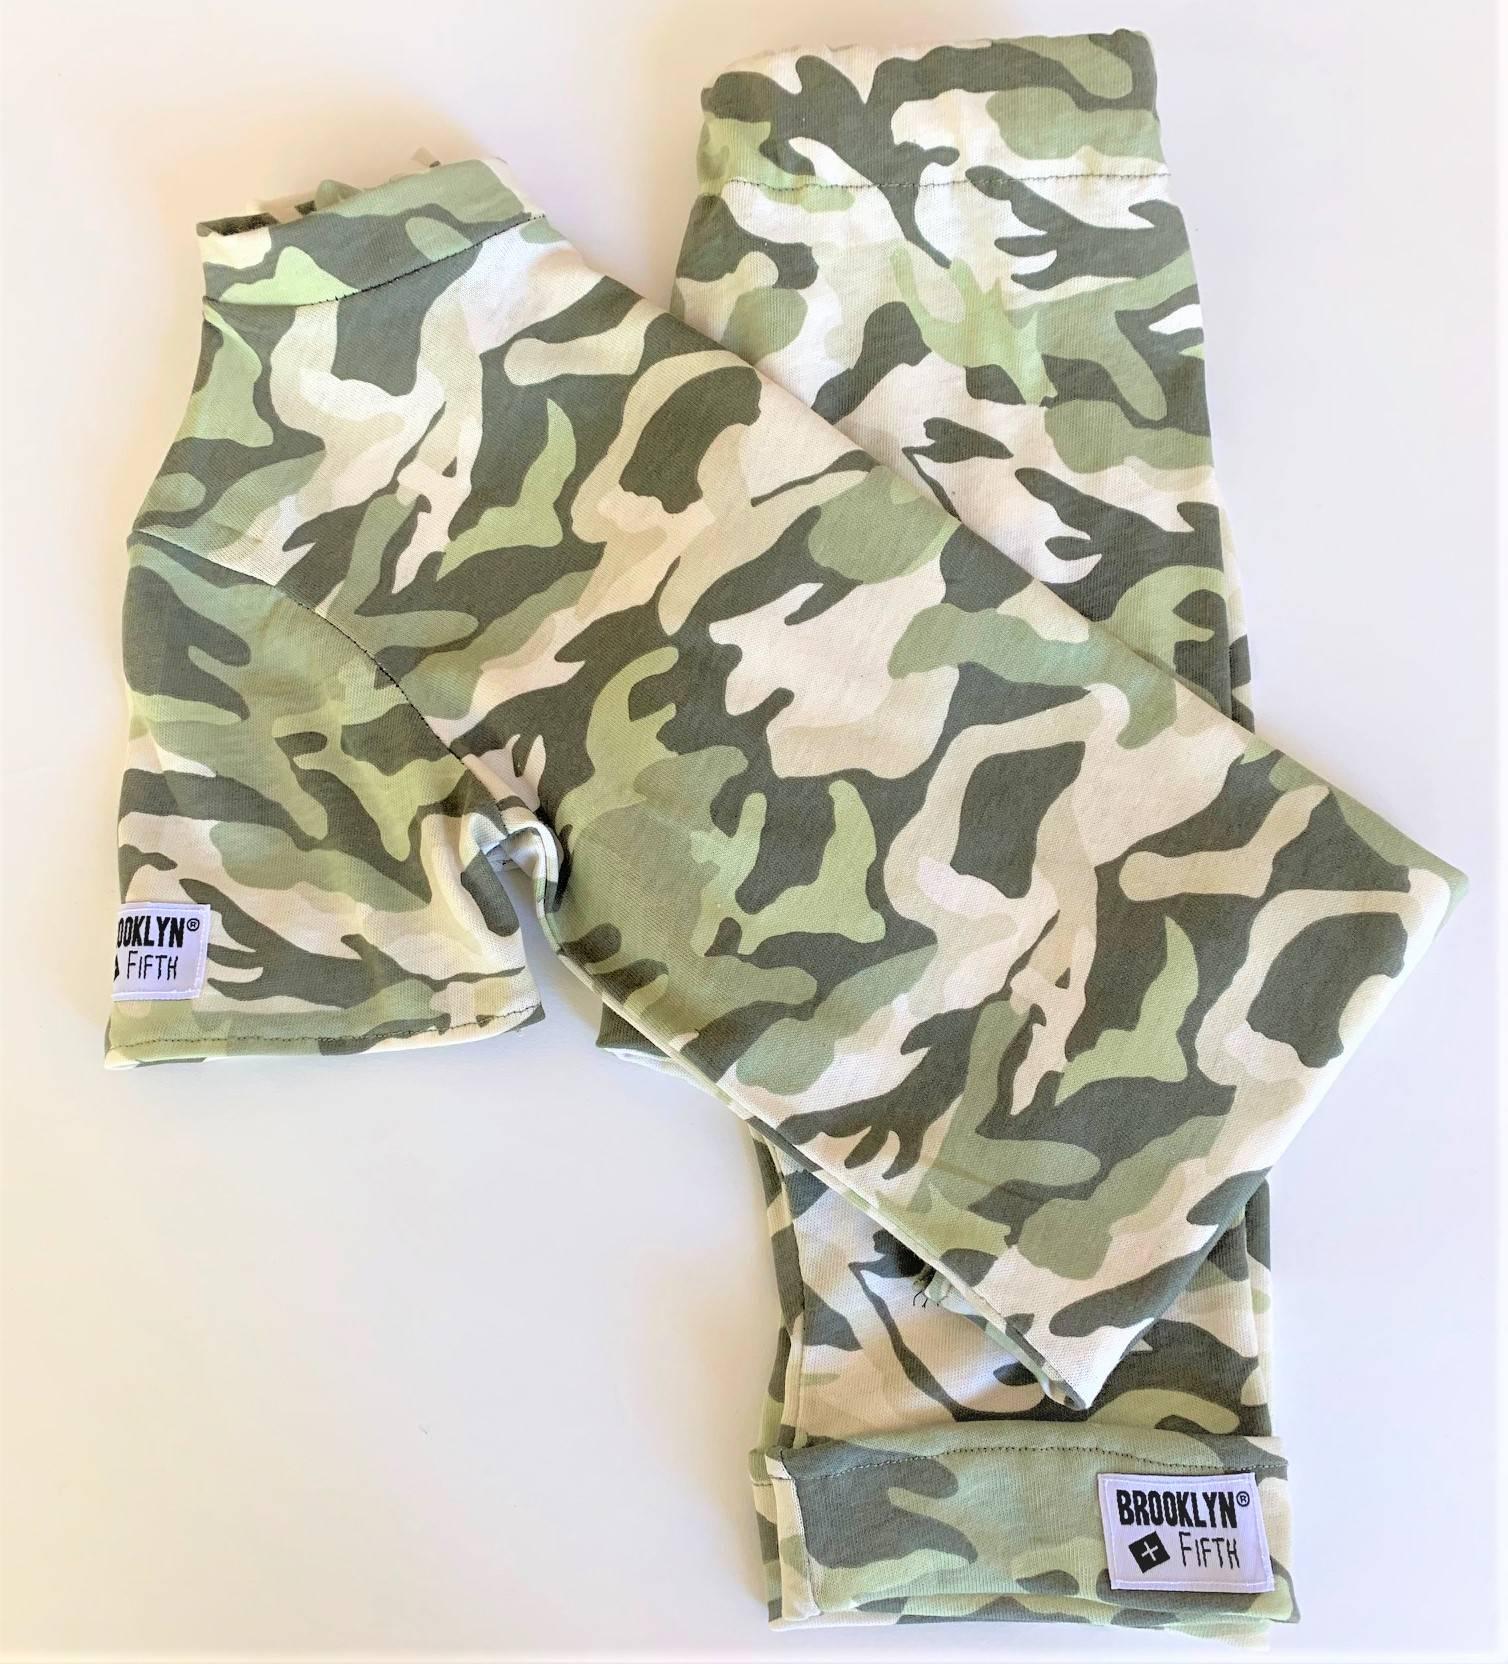 Brooklyn + Fifth camo shorts camo tees camo shorts and tee shirts camo harem pants camo  leggings elastic waistband comfy pants boys camo pants boys toddlers infants lightweight